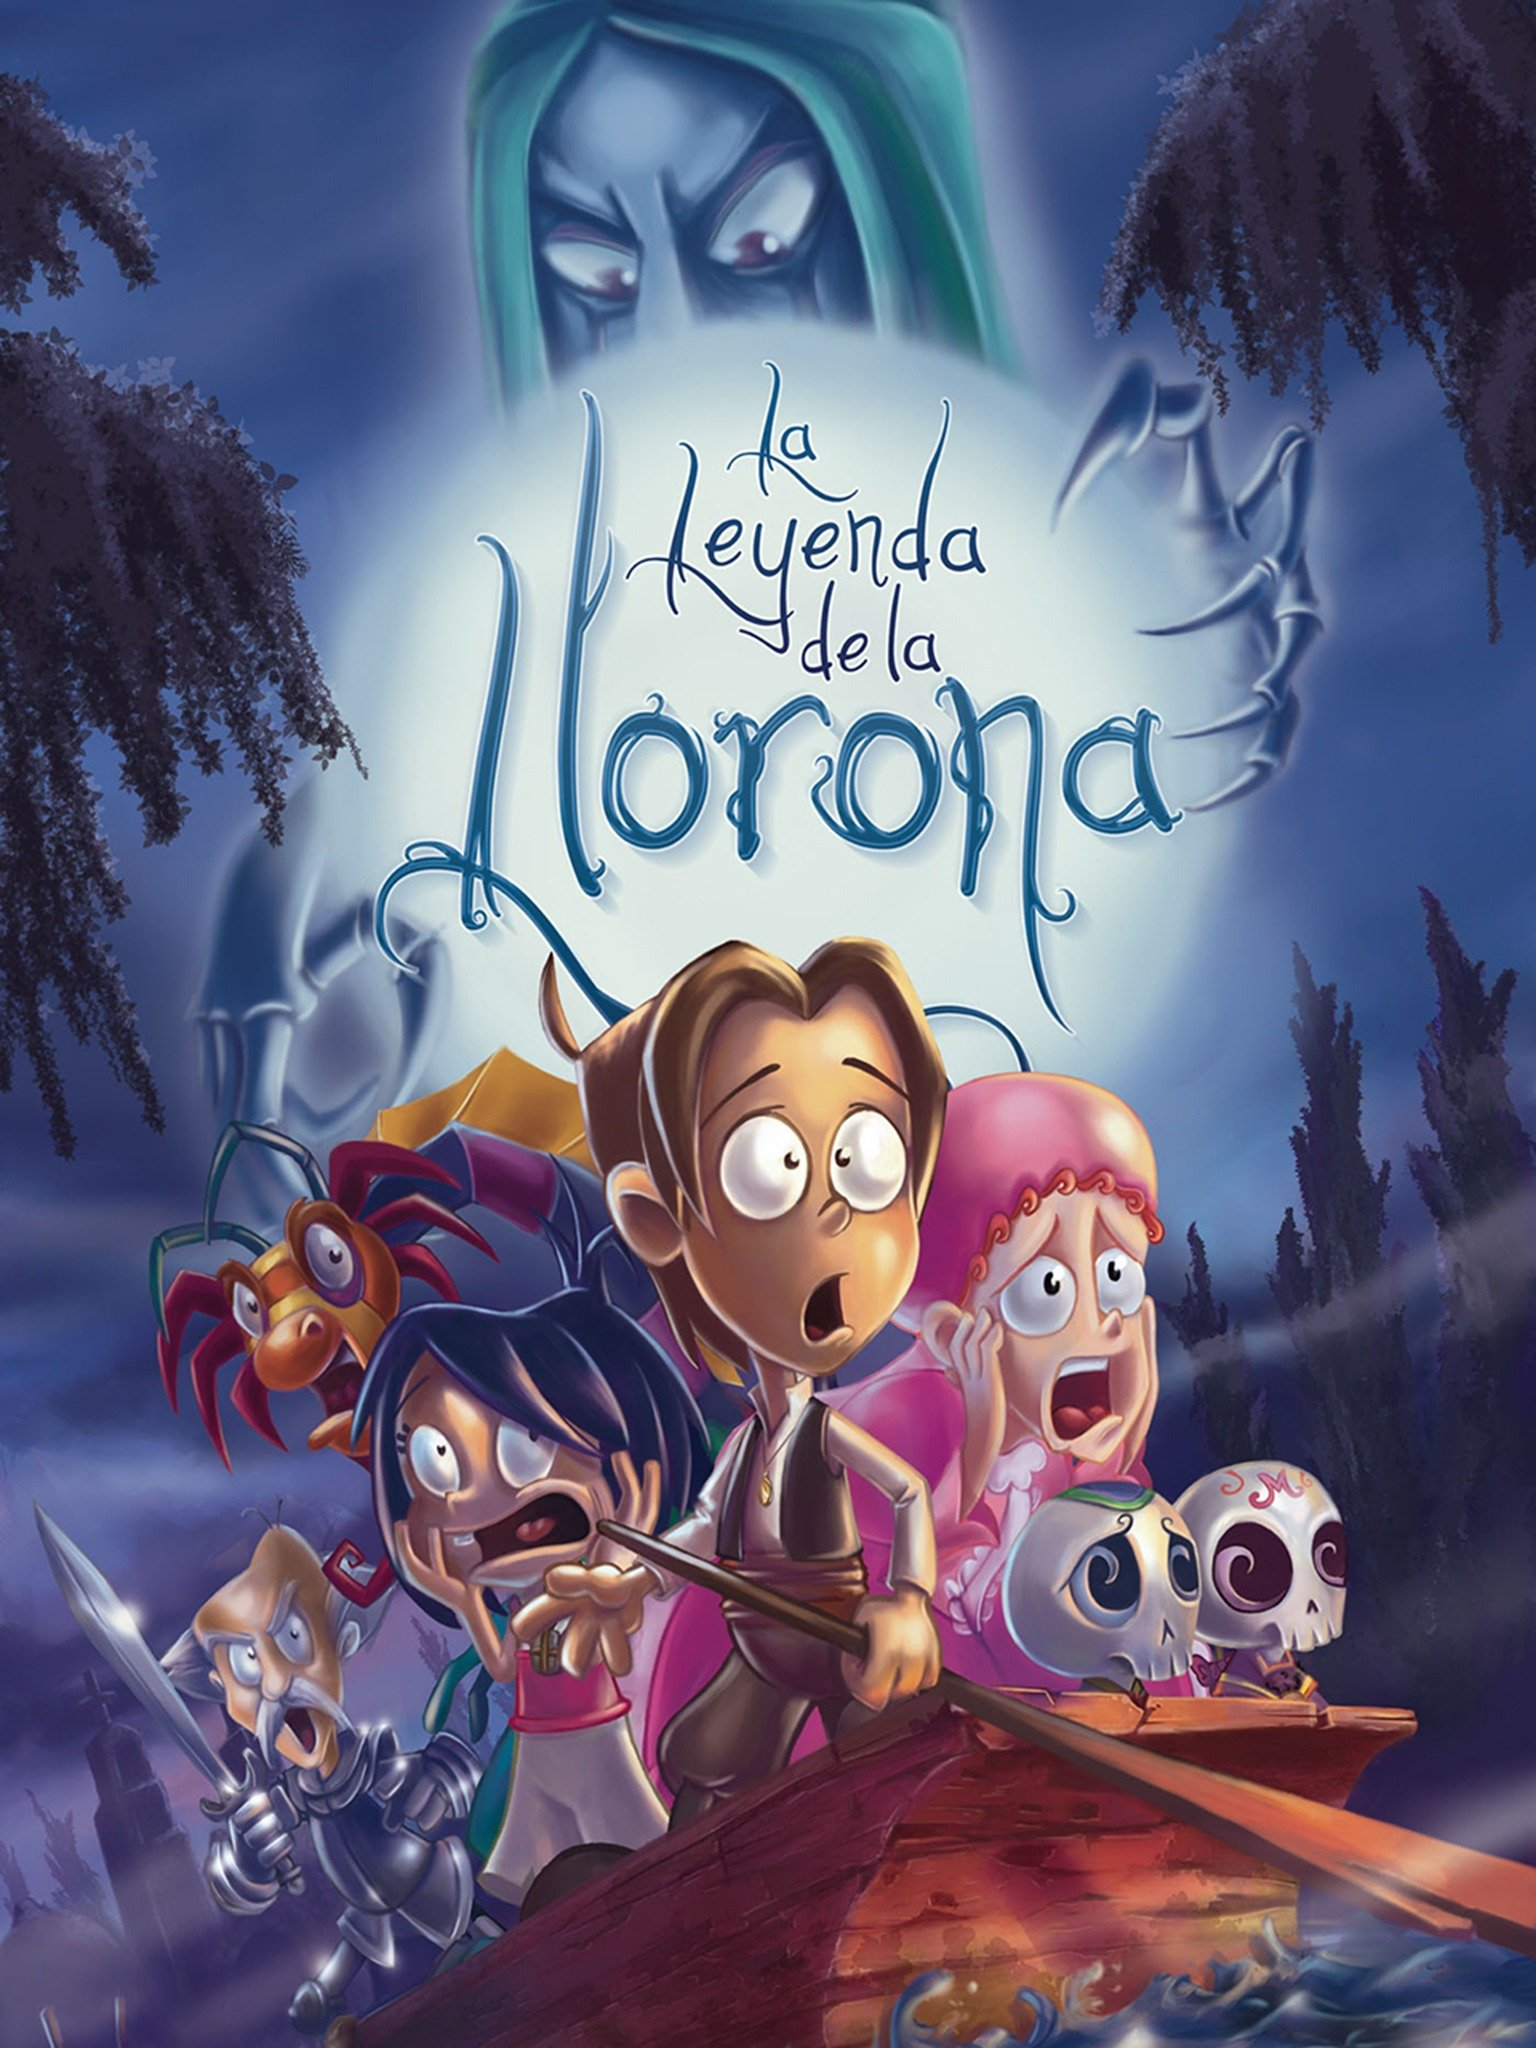 La Leyenda De La Llorona 2011 Rotten Tomatoes